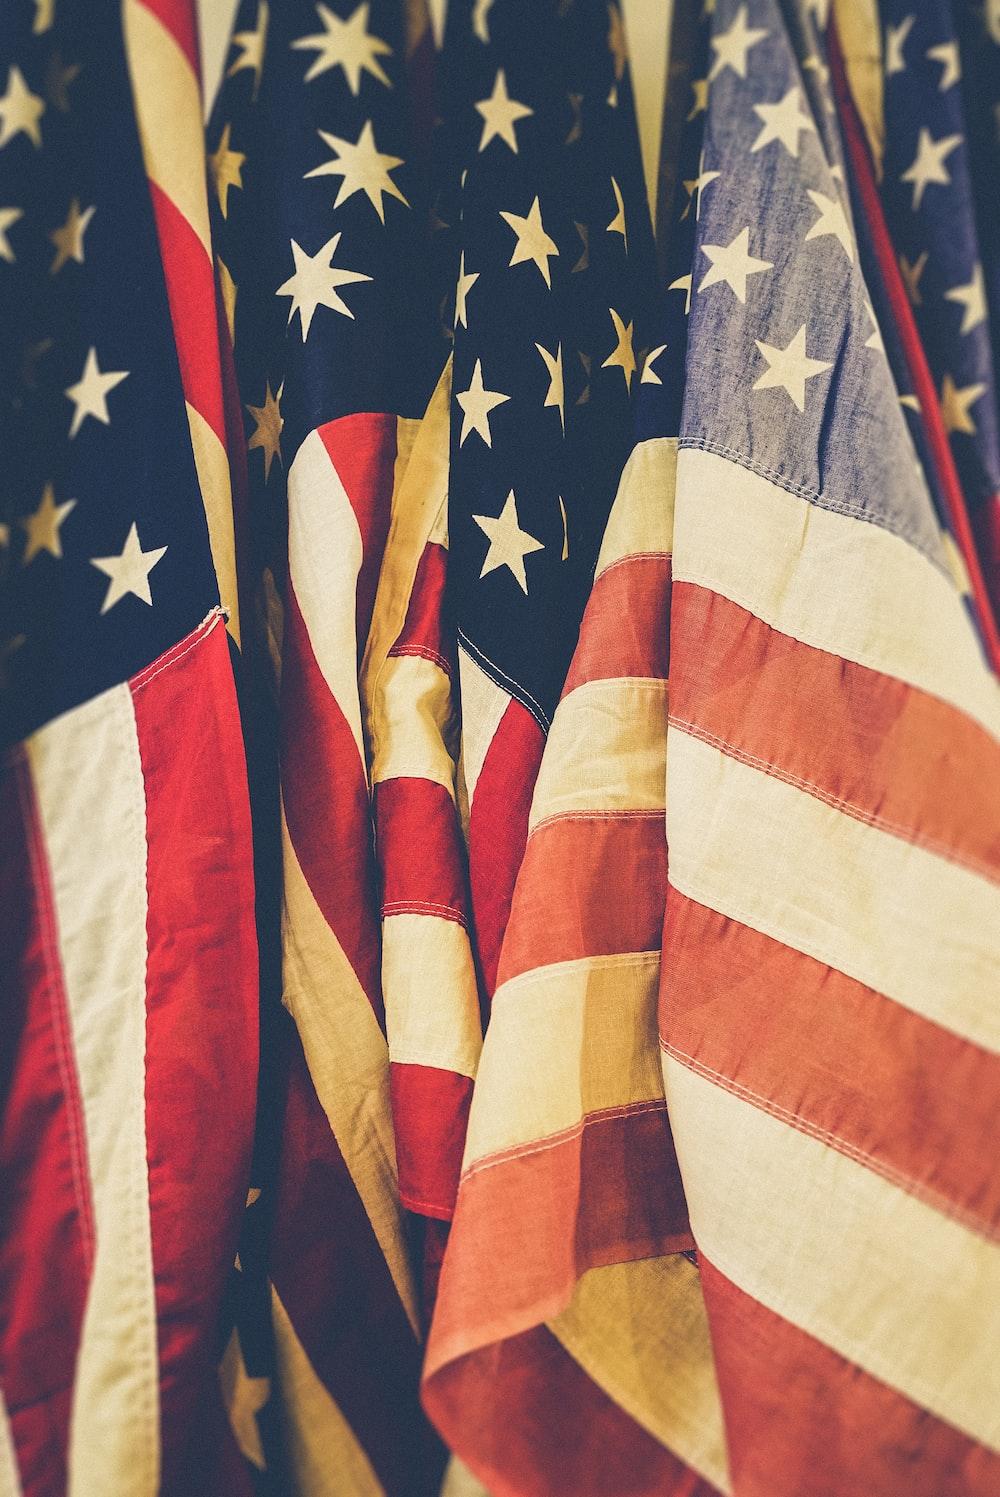 closeup photo of United States of America flag